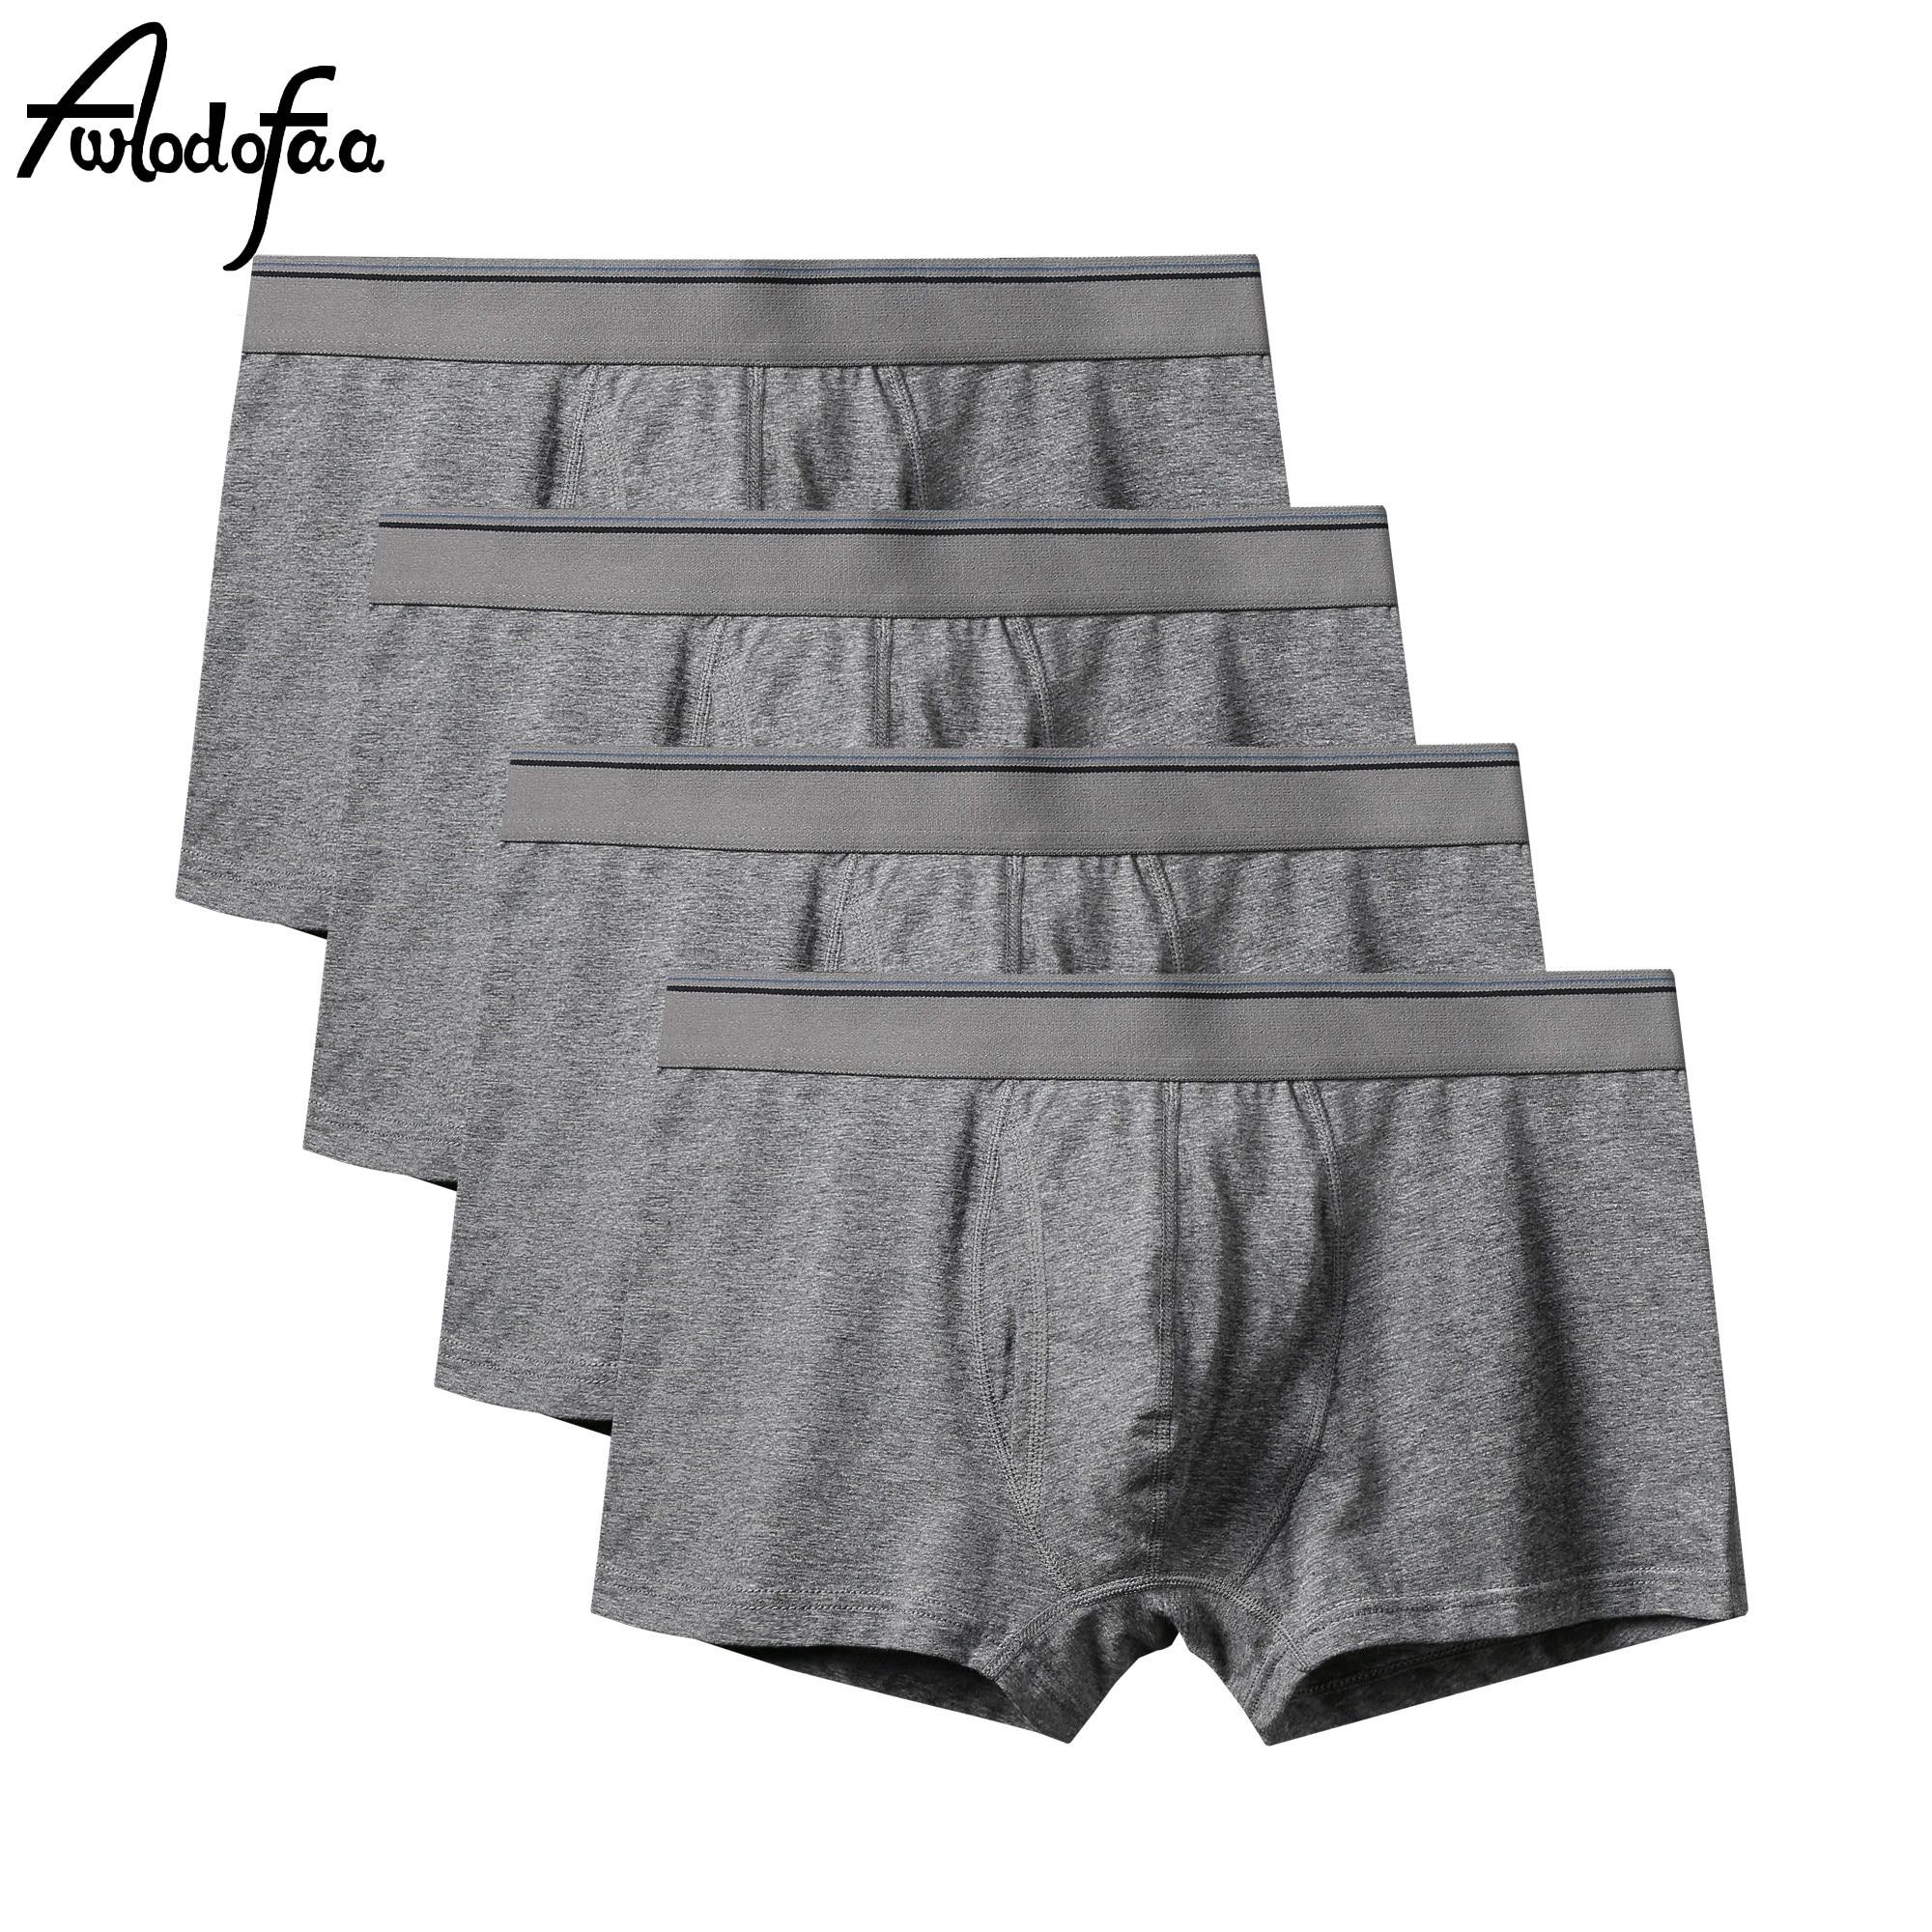 4Pcs/lot New Fashion Sexy Brand High Quality Cotton Men's Boxer Shorts Mr Plus Size Underwear Man Un